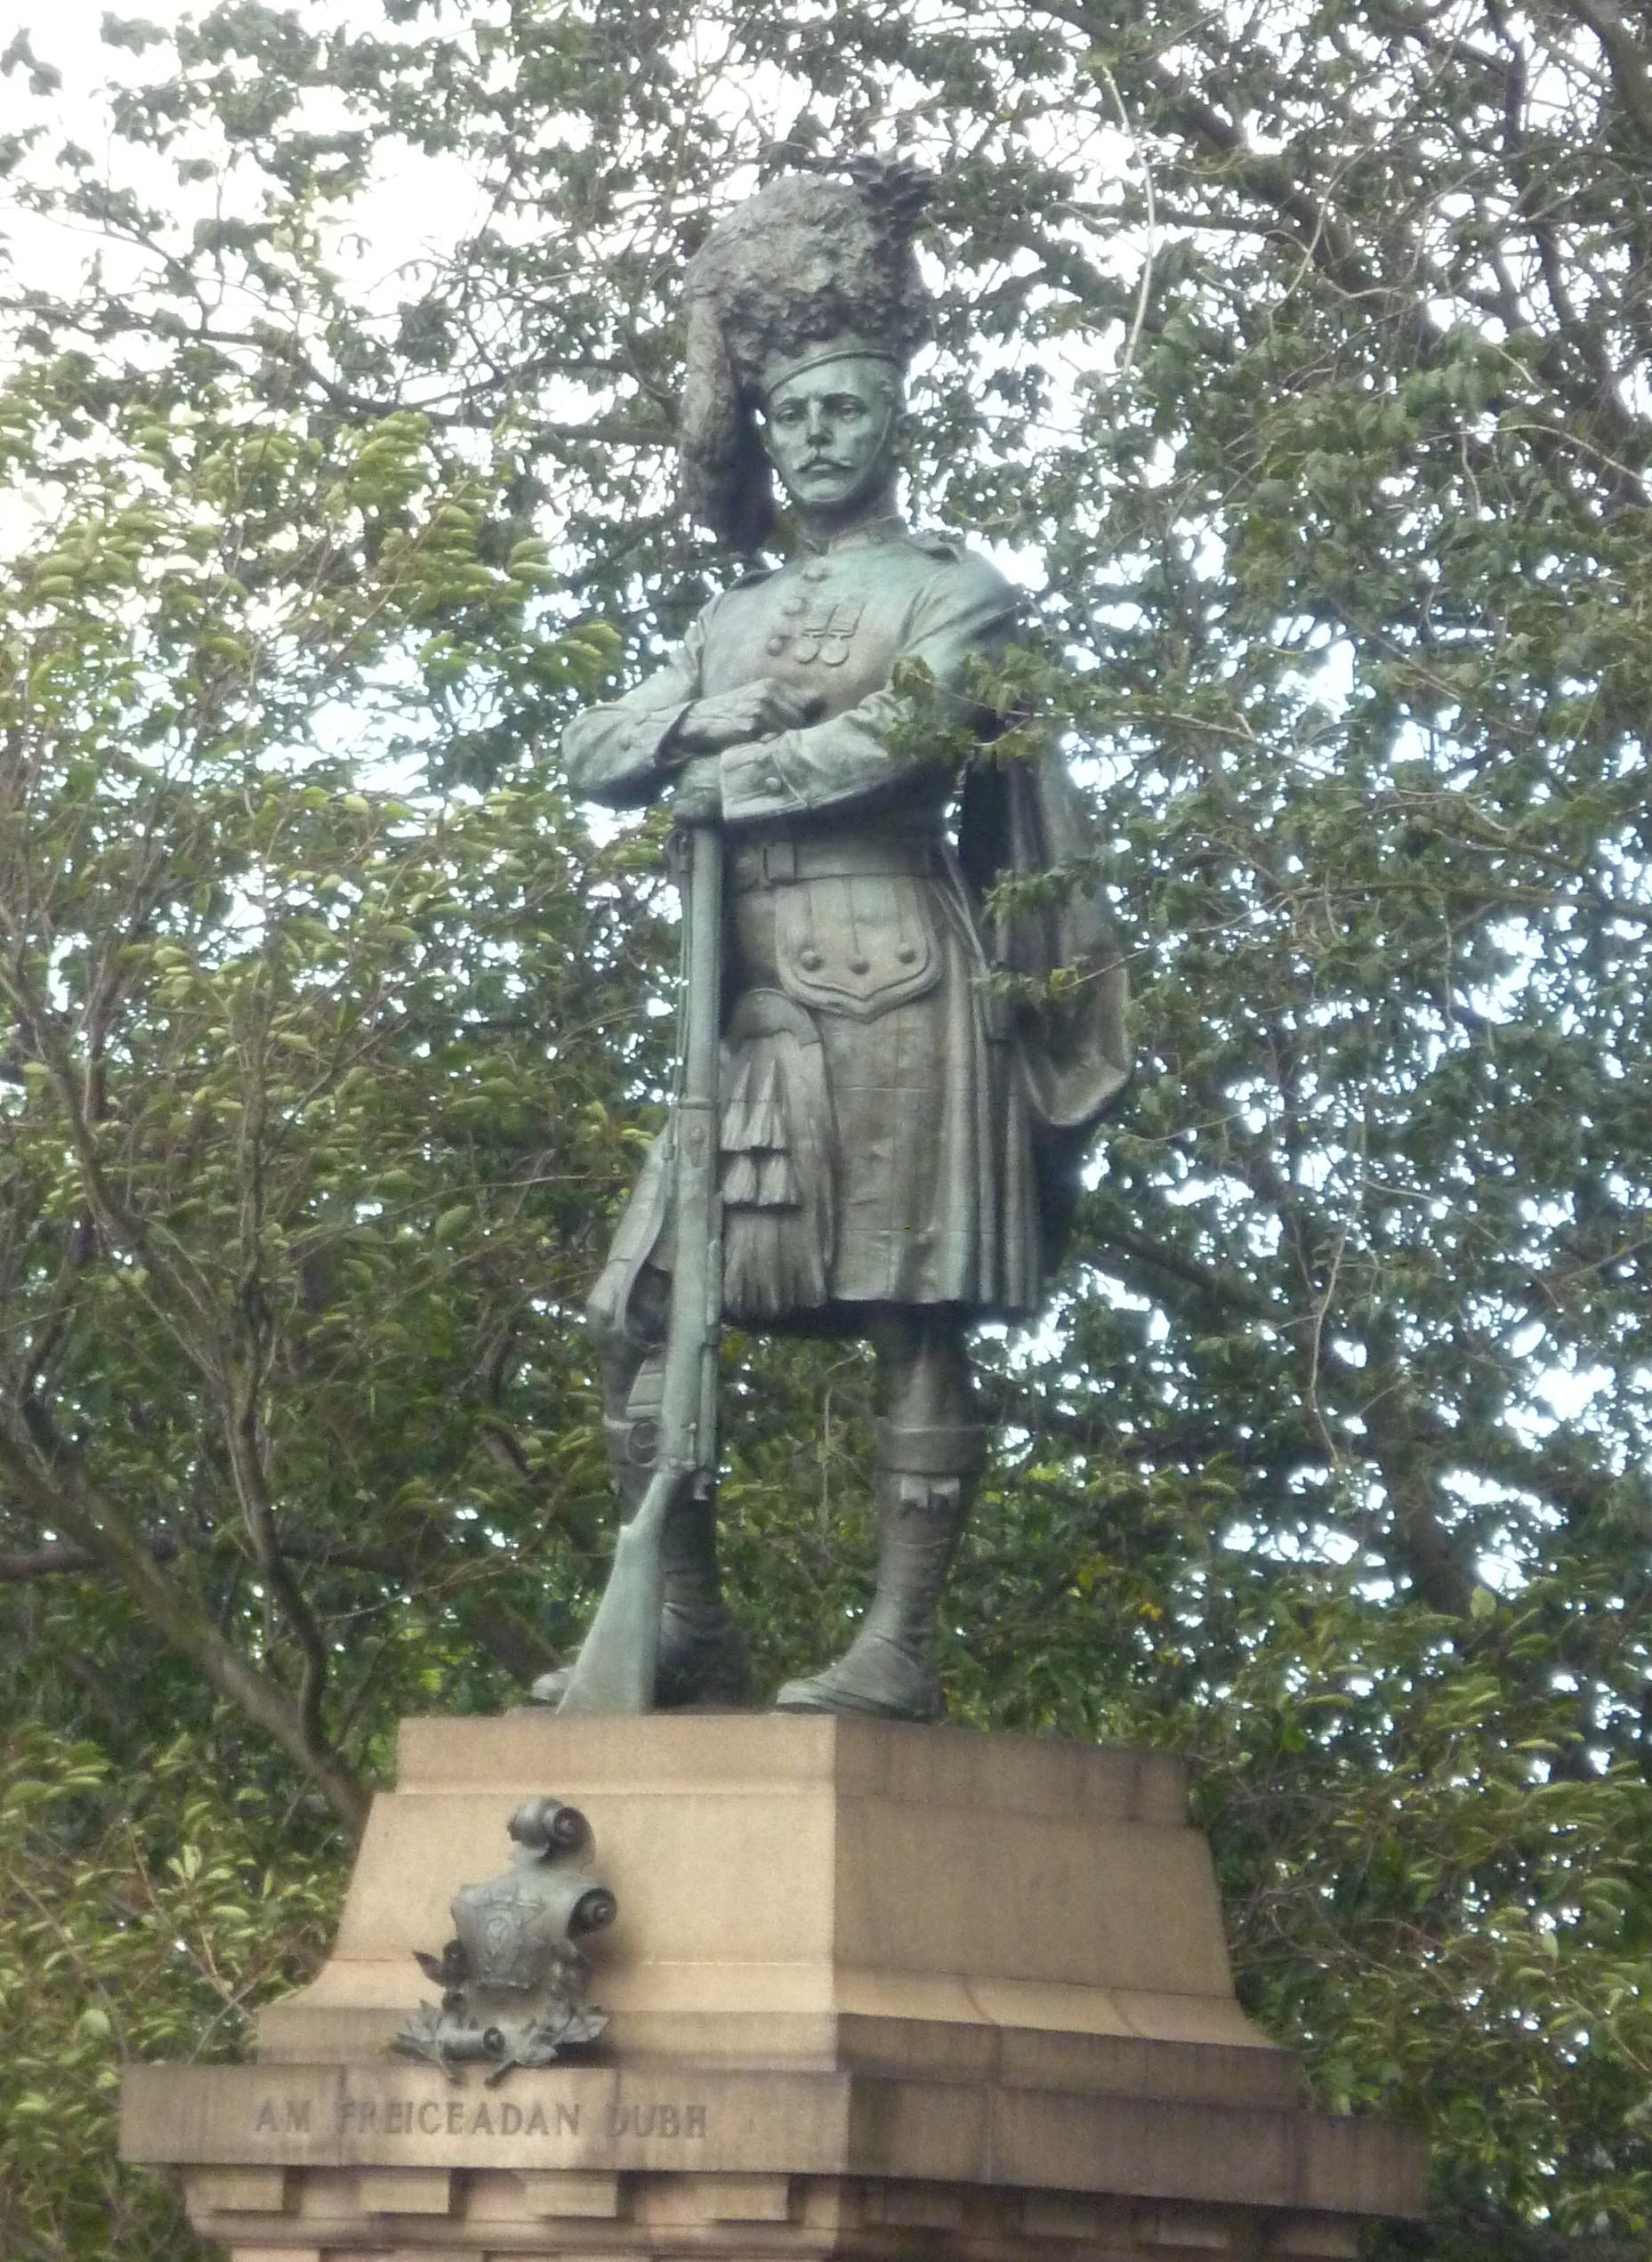 Black Watch Memorial on the Mound, Edinburgh